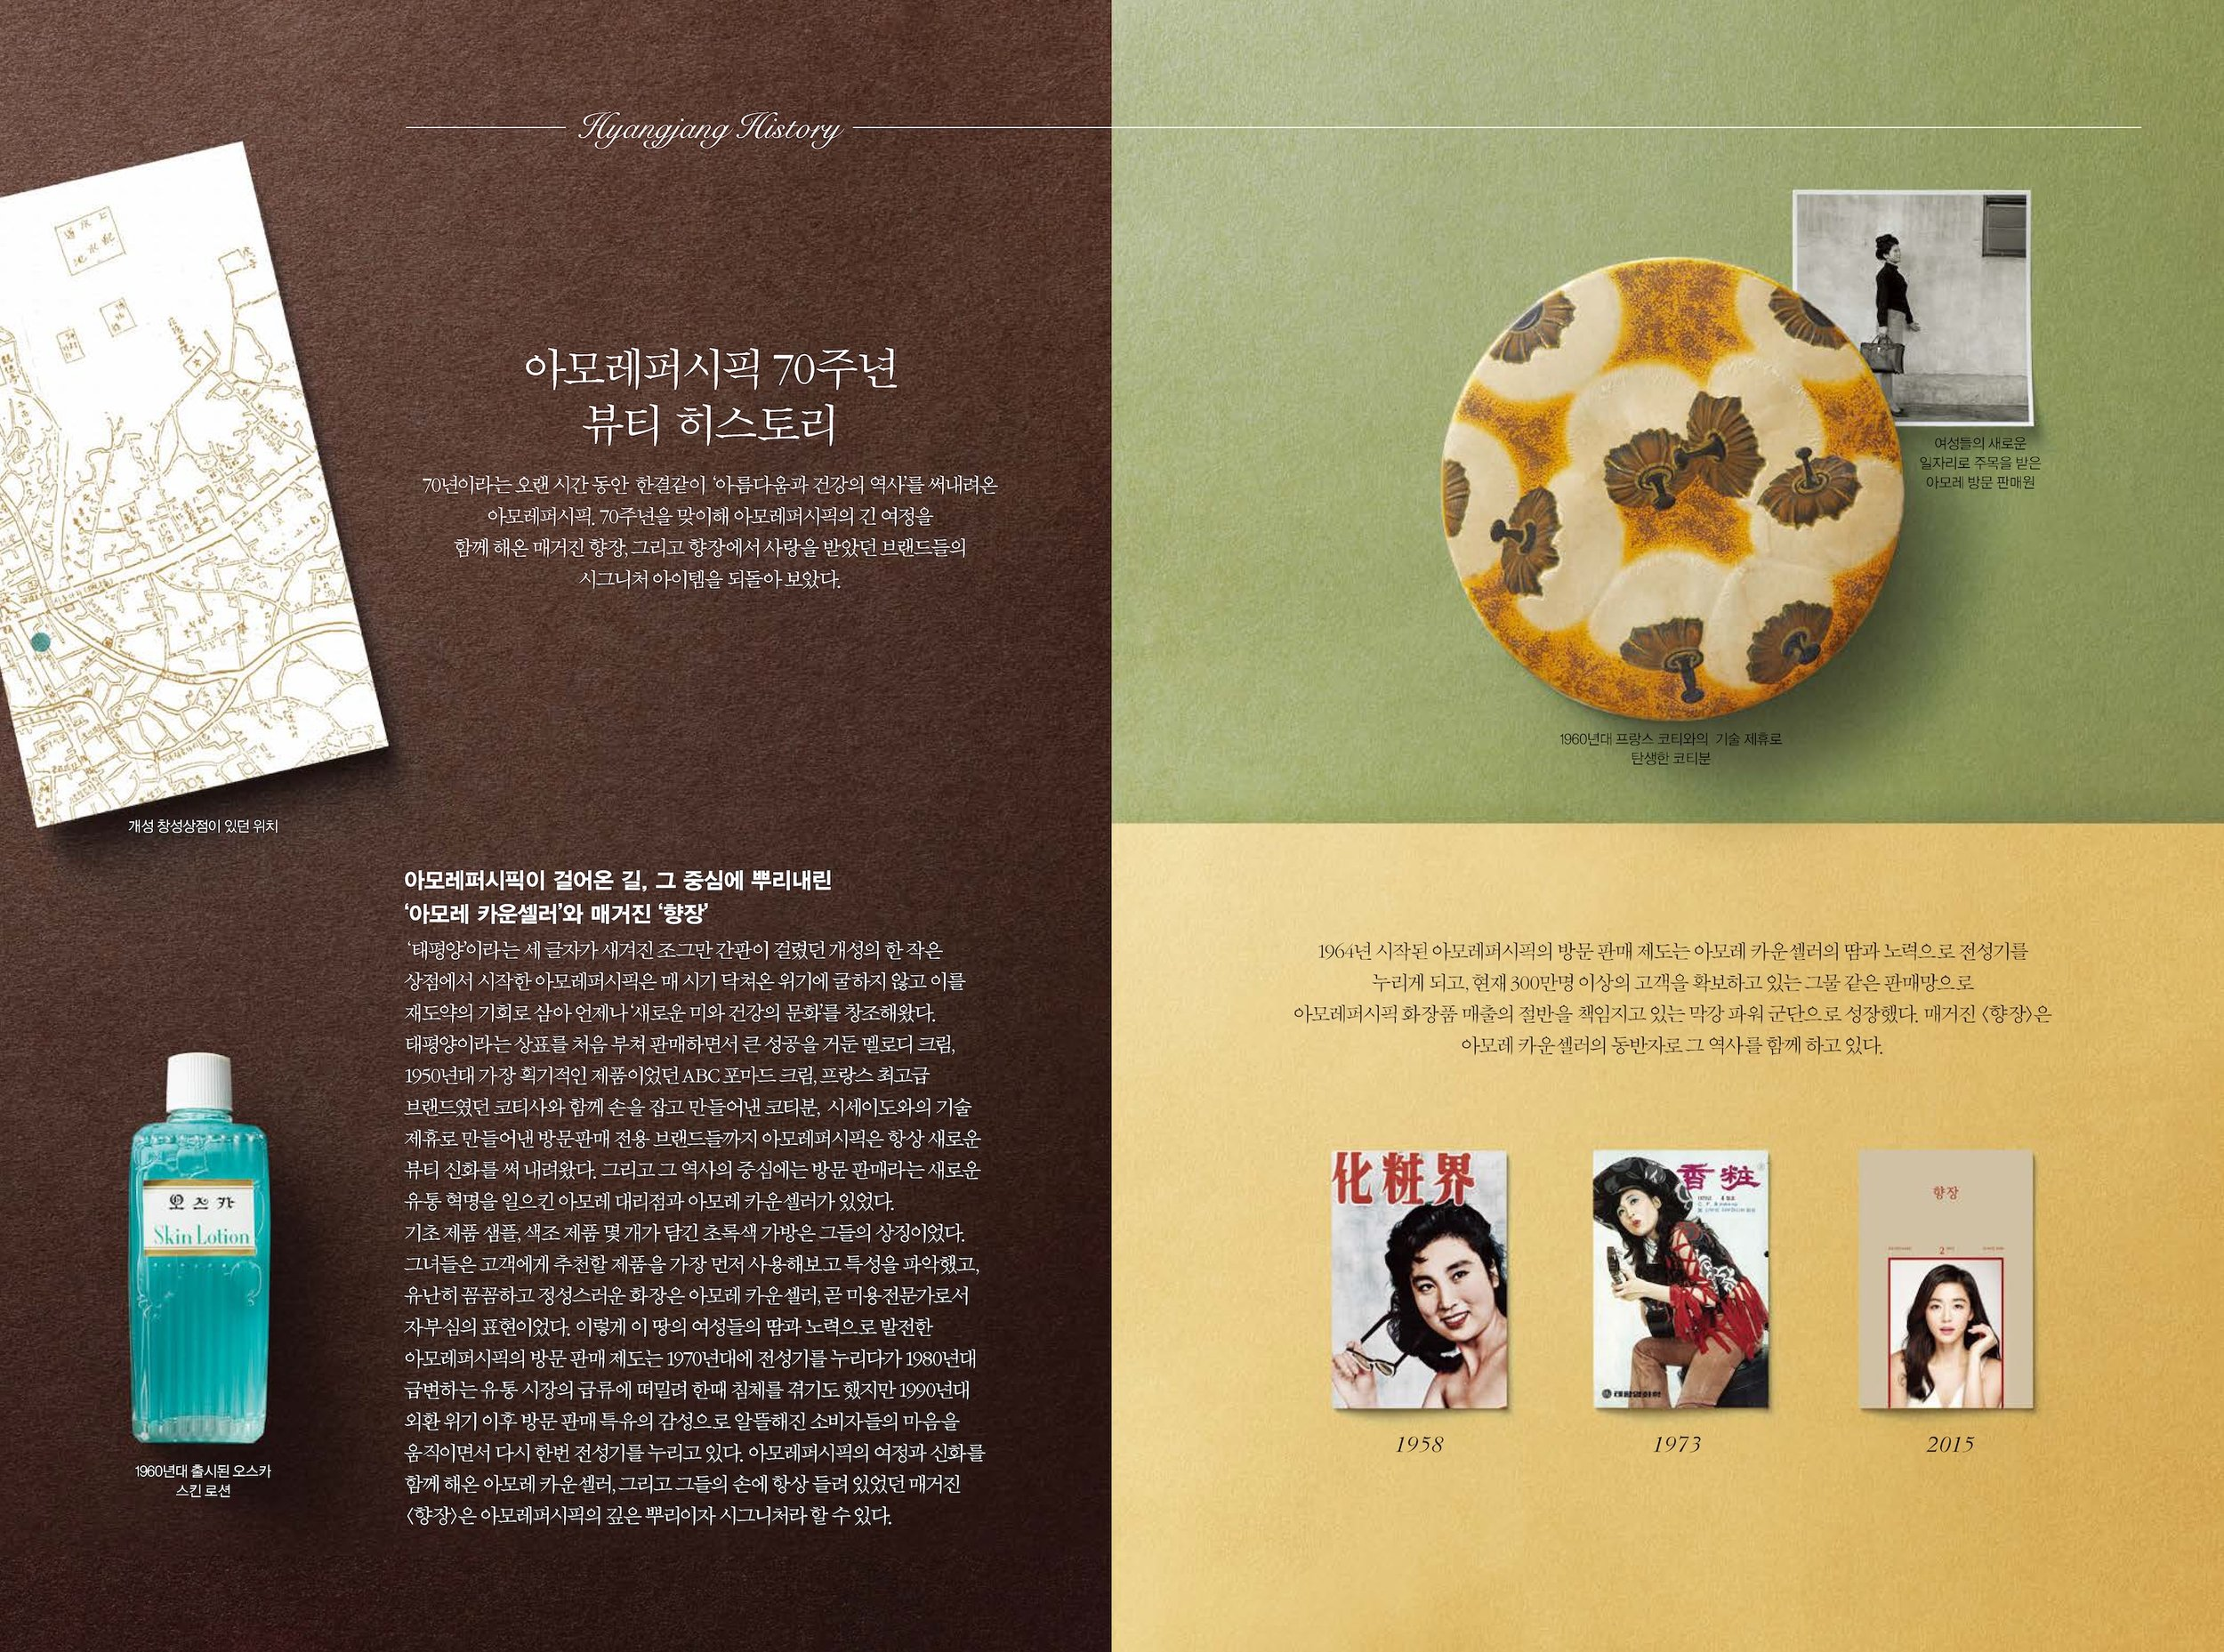 hyangjang-201509_페이지_16.jpeg